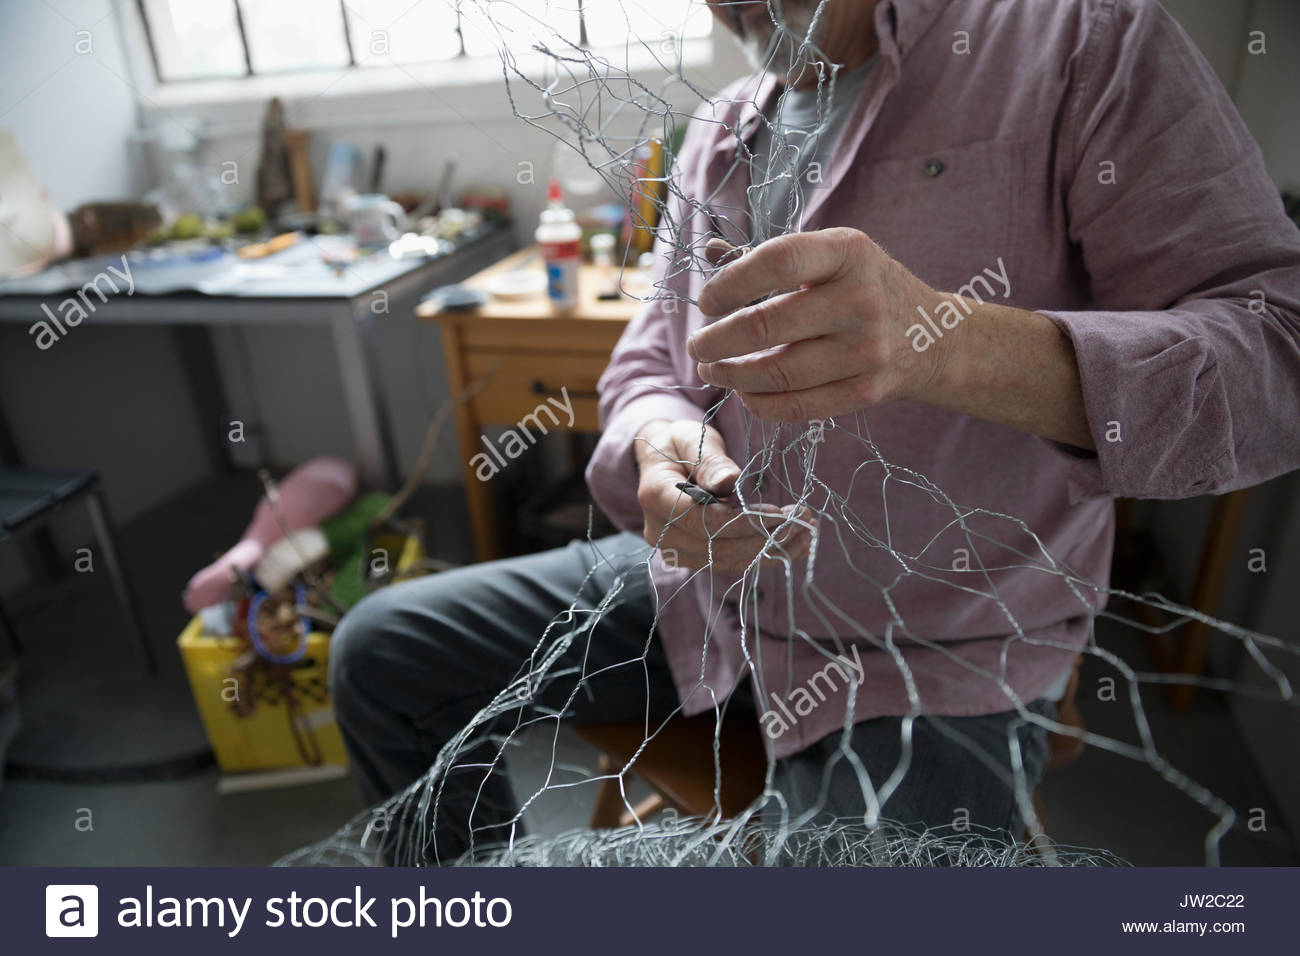 Artista Masculino formando el alambre en el art studio Imagen De Stock